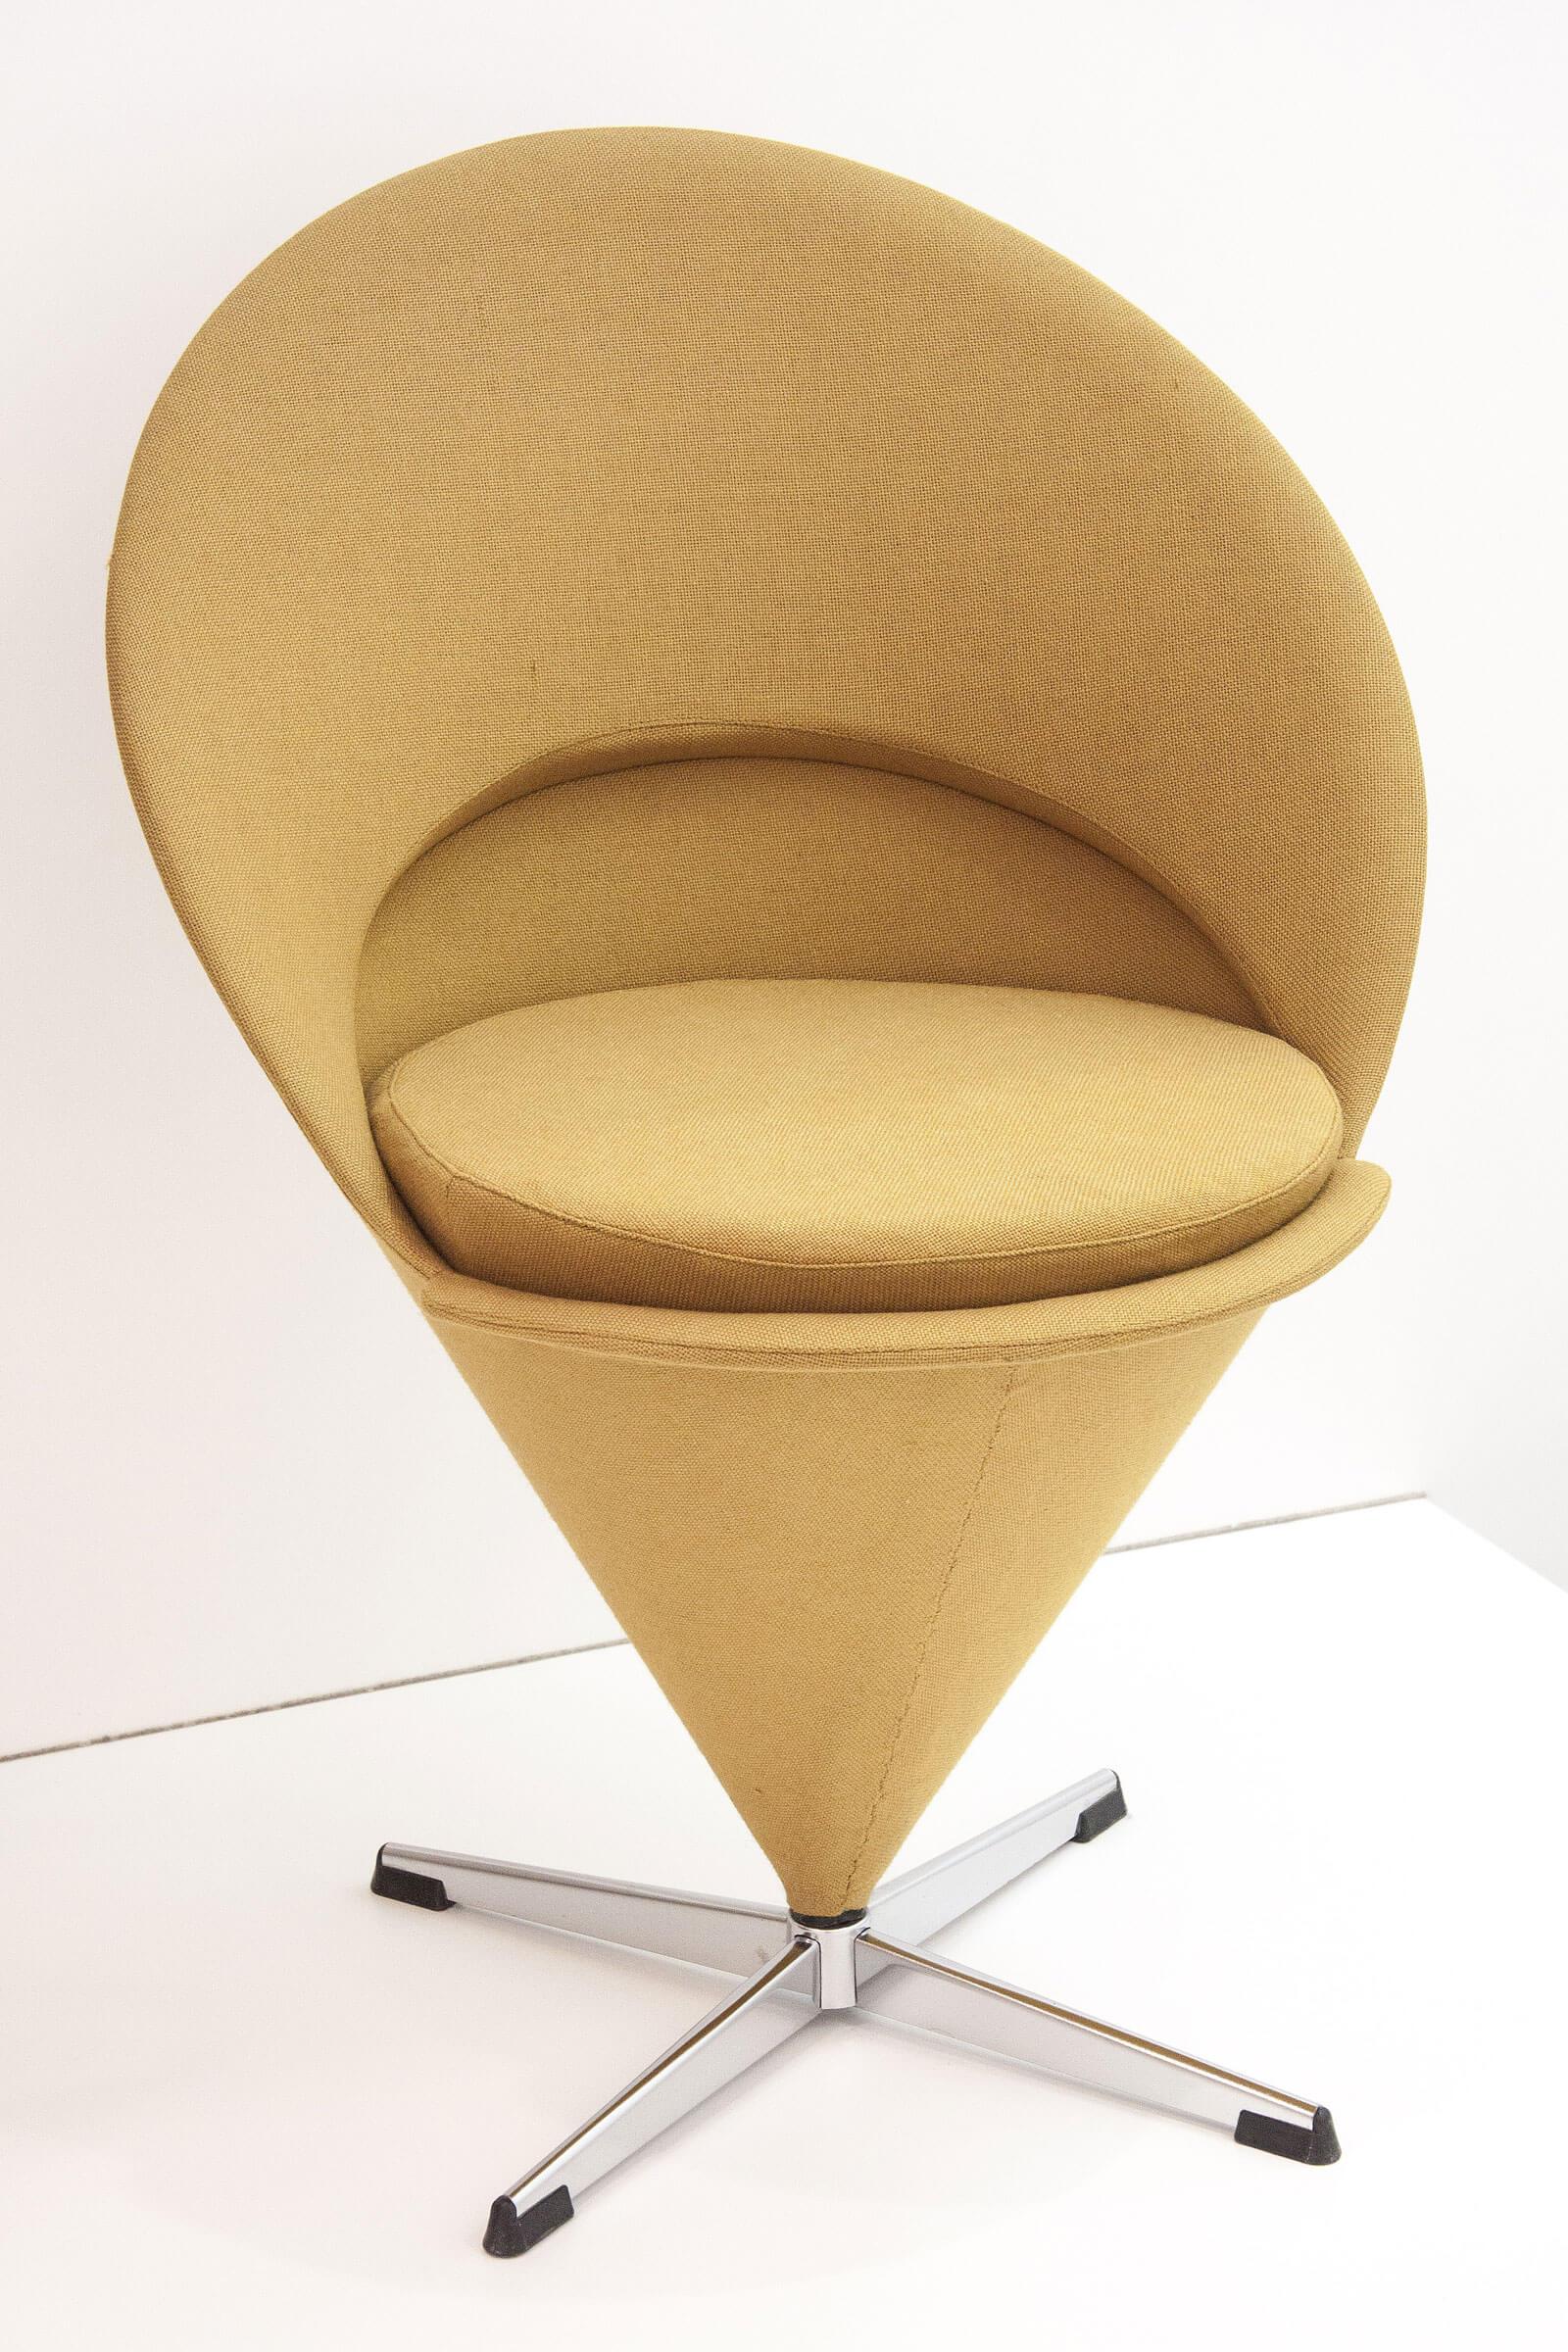 Pop art stílus Panton szék